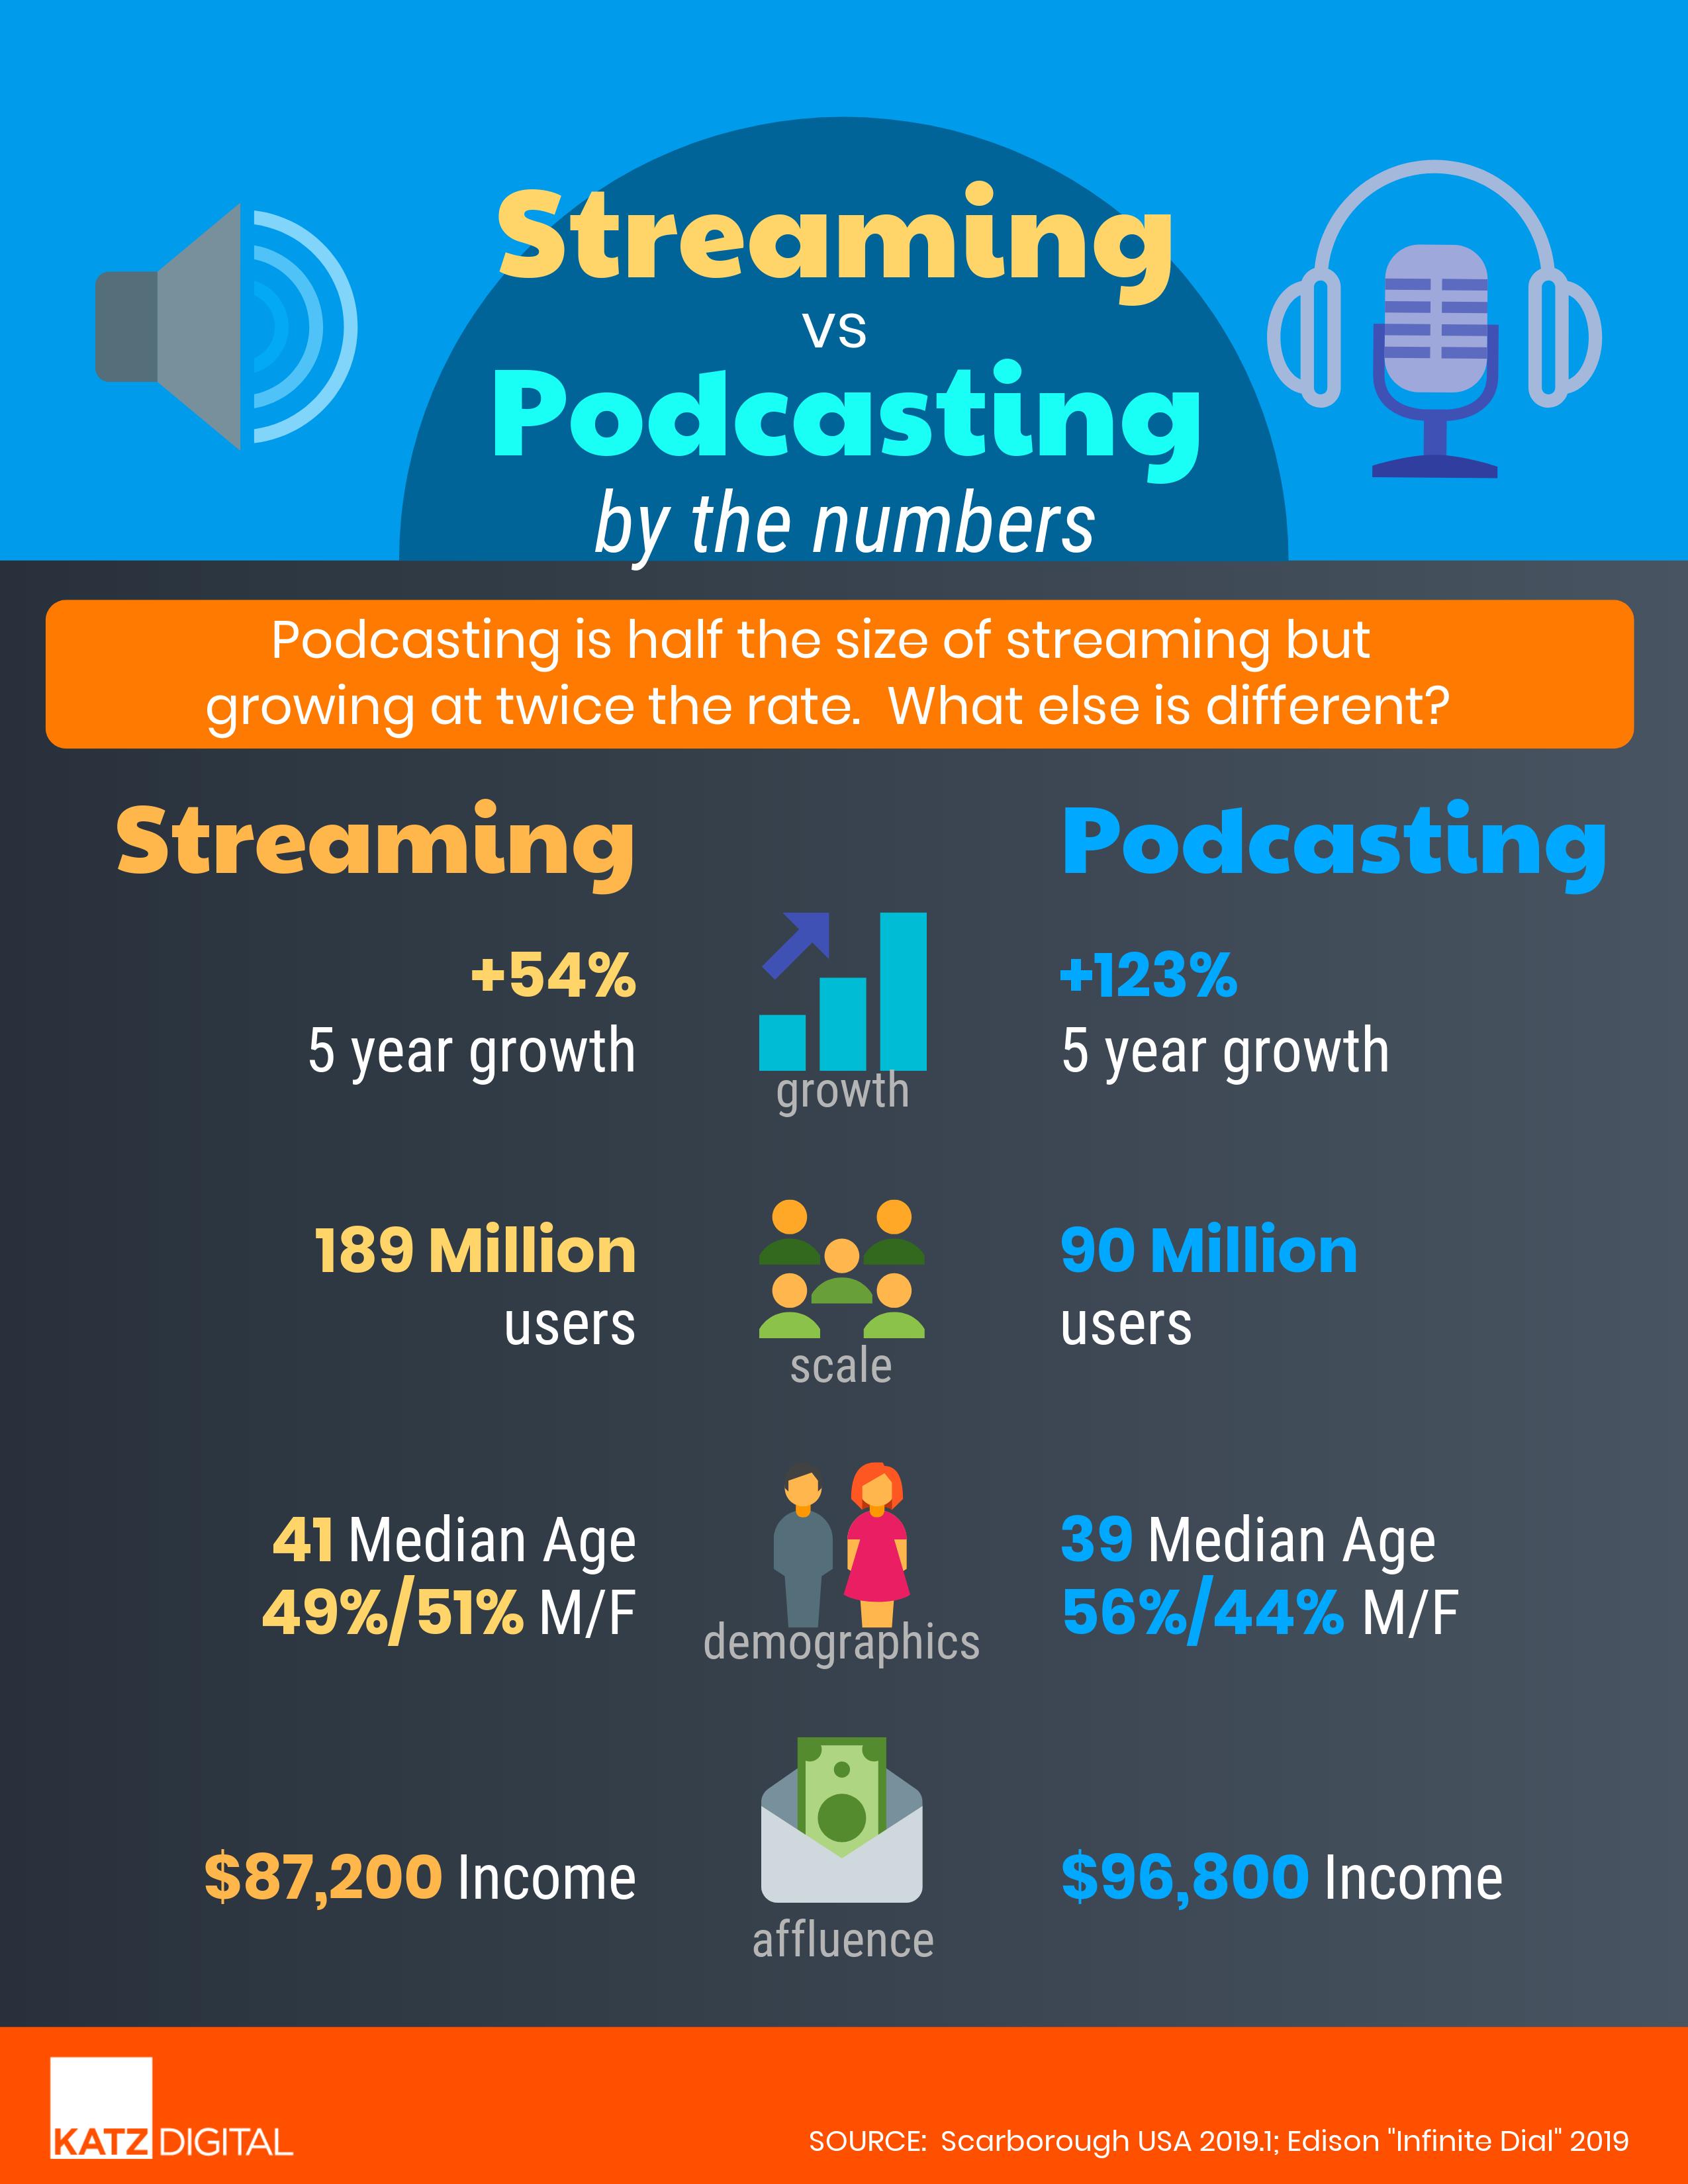 Streaming v Podcasting